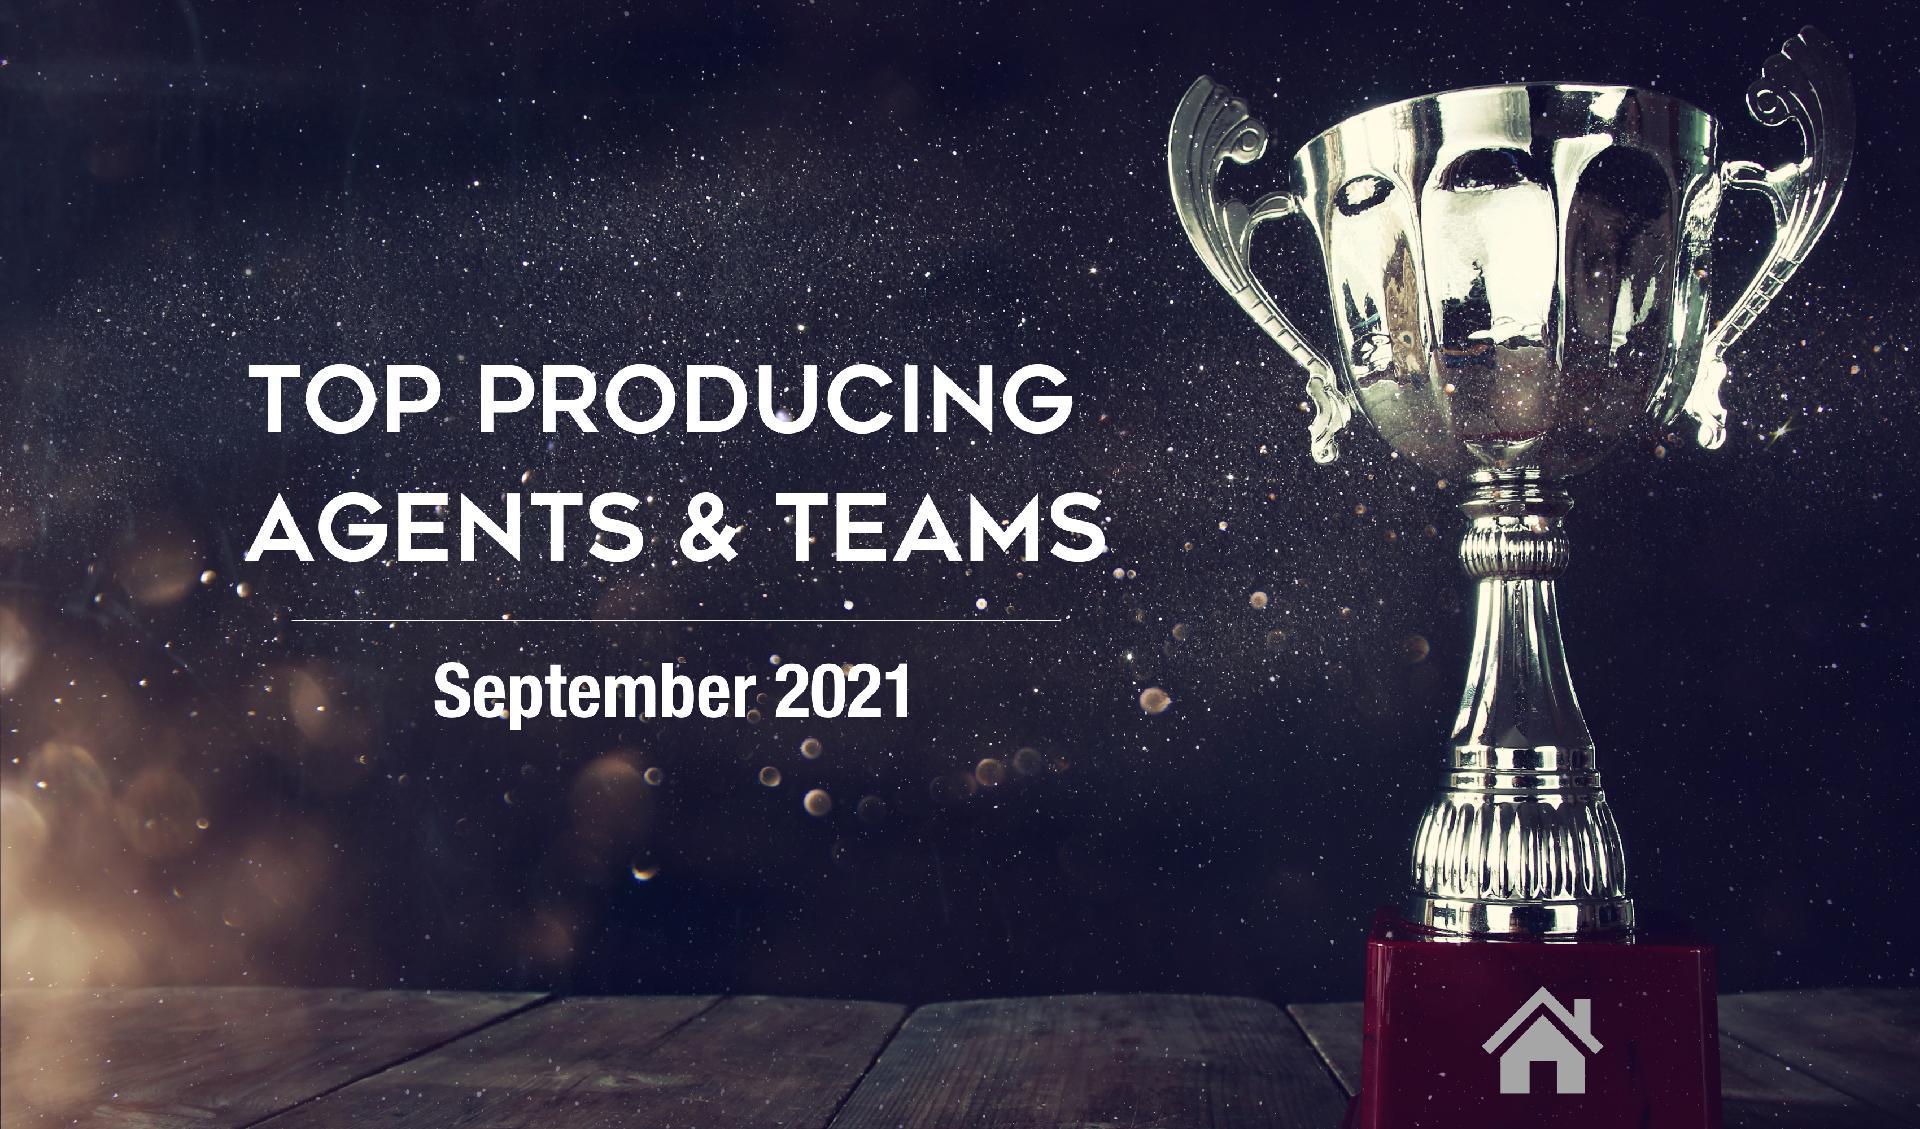 CONGRATULATIONS Top Agents & Teams! September 2021 - North Carolina Main Photo